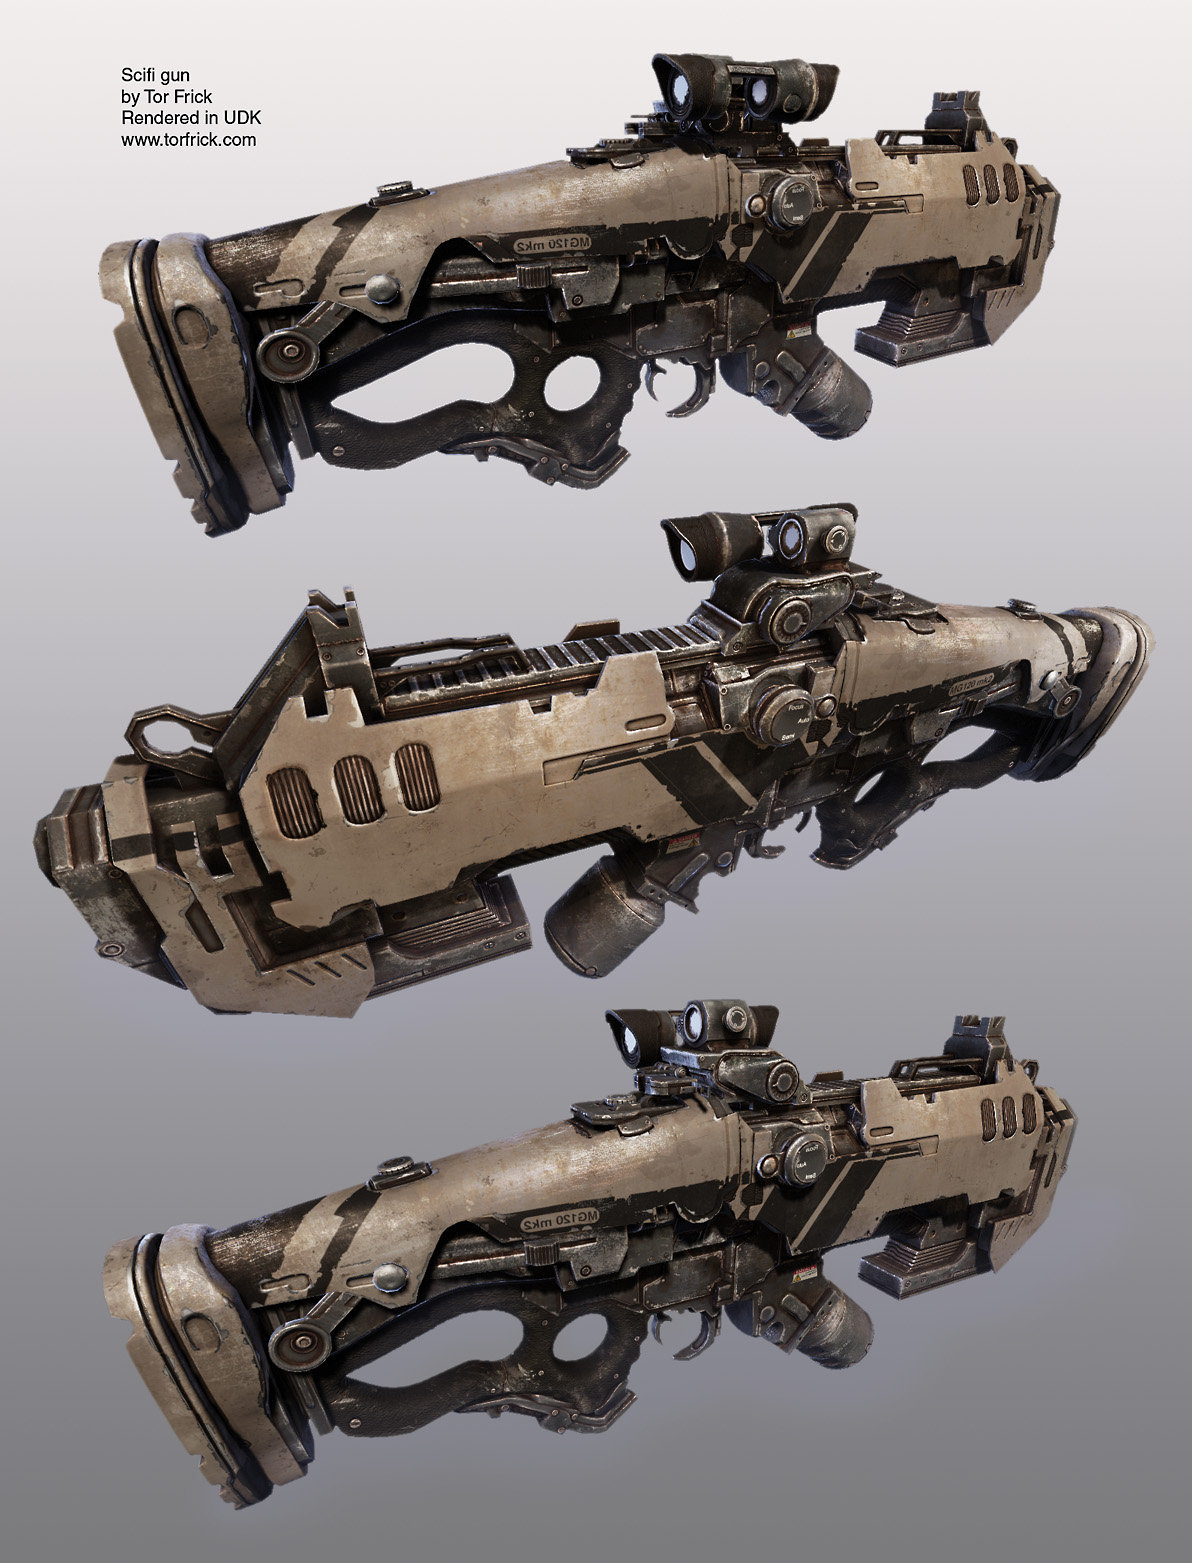 tor-frick-carbine1.jpg?1405942874